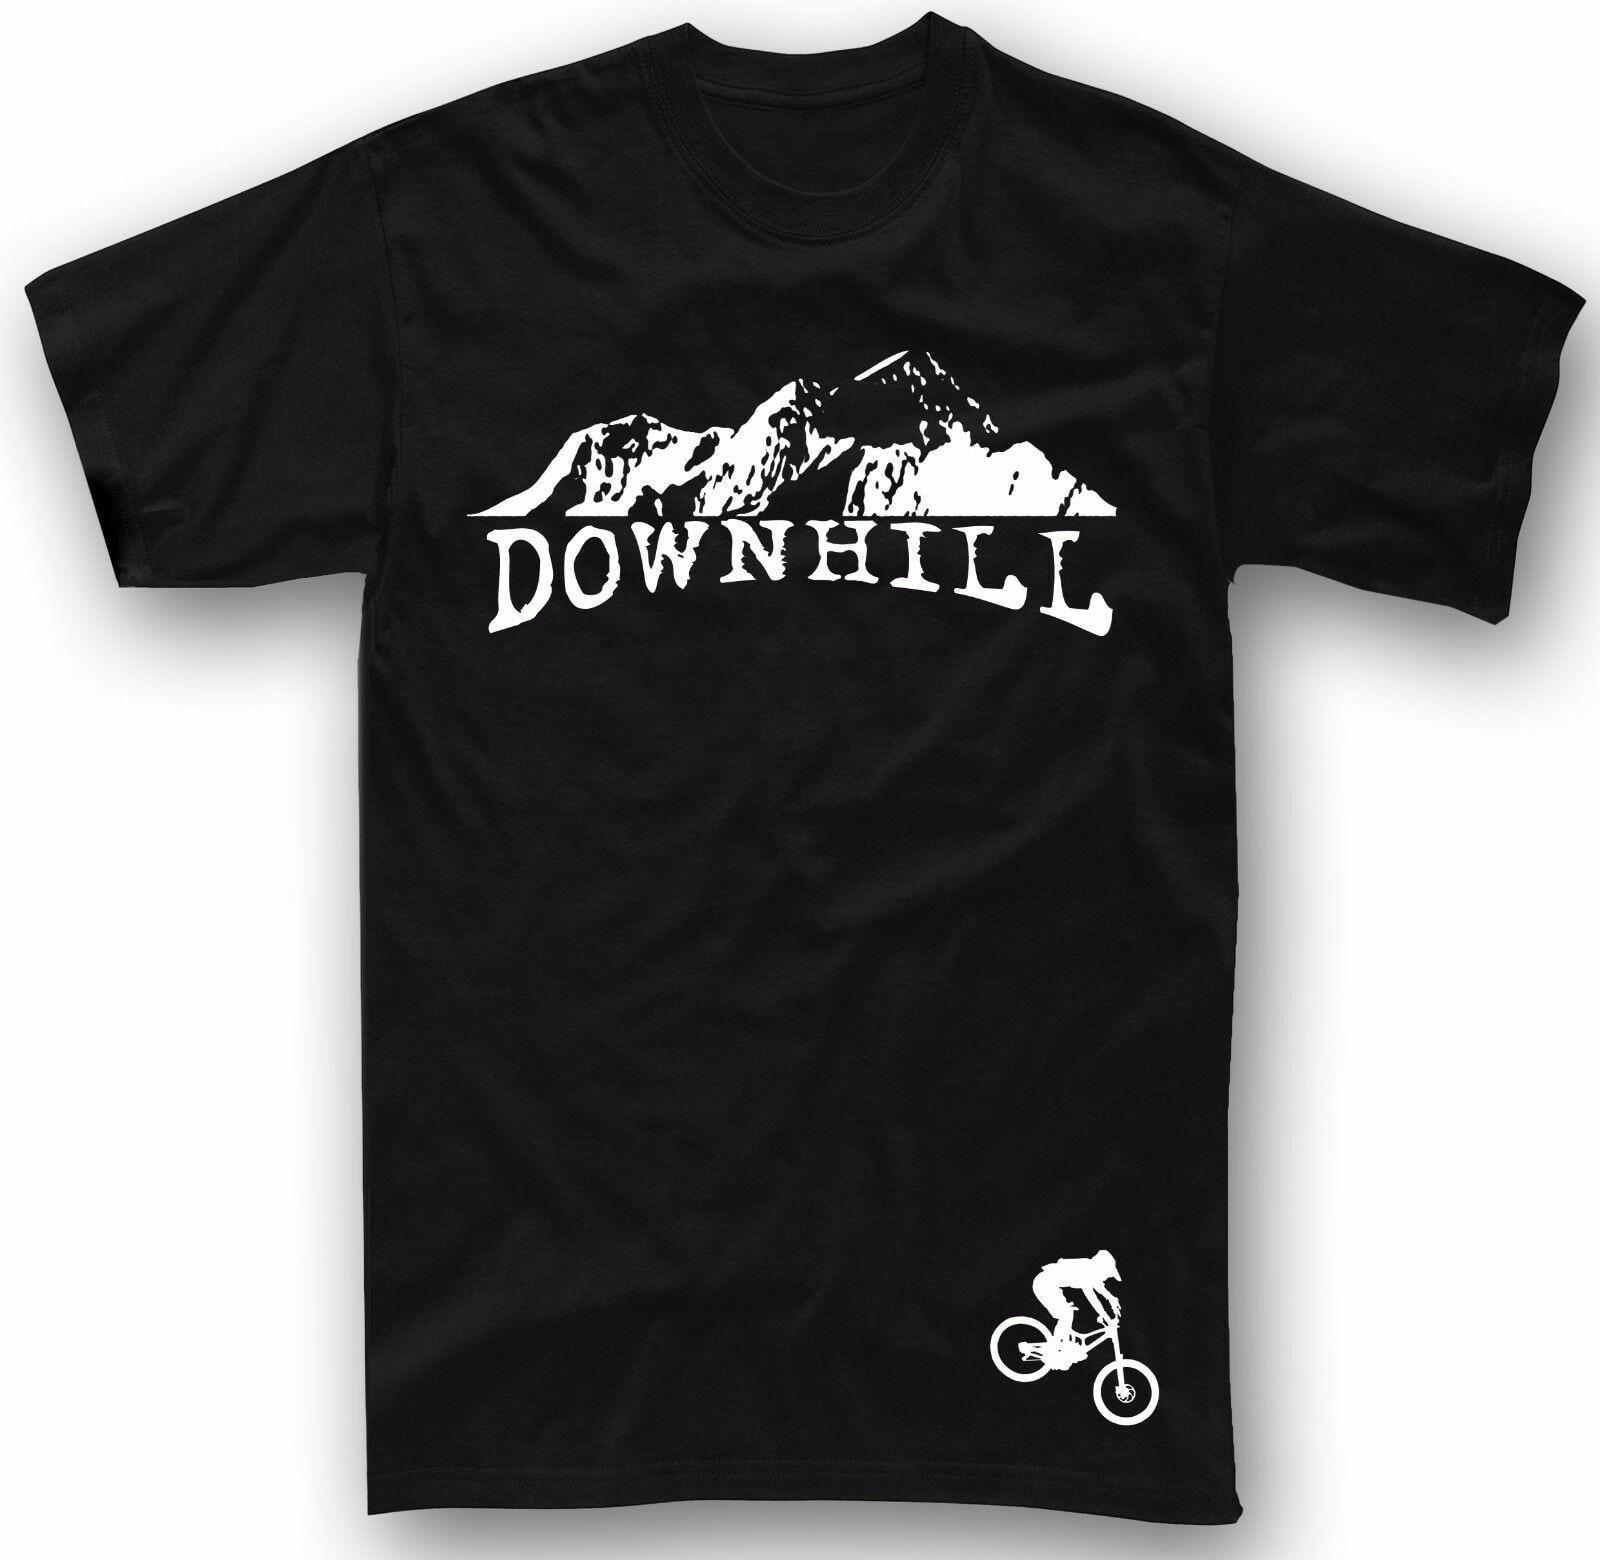 New ROCKY MOUNTAIN BIKE BICYCLE COMPANY LOGO Men/'s Black T-Shirt S-3XL